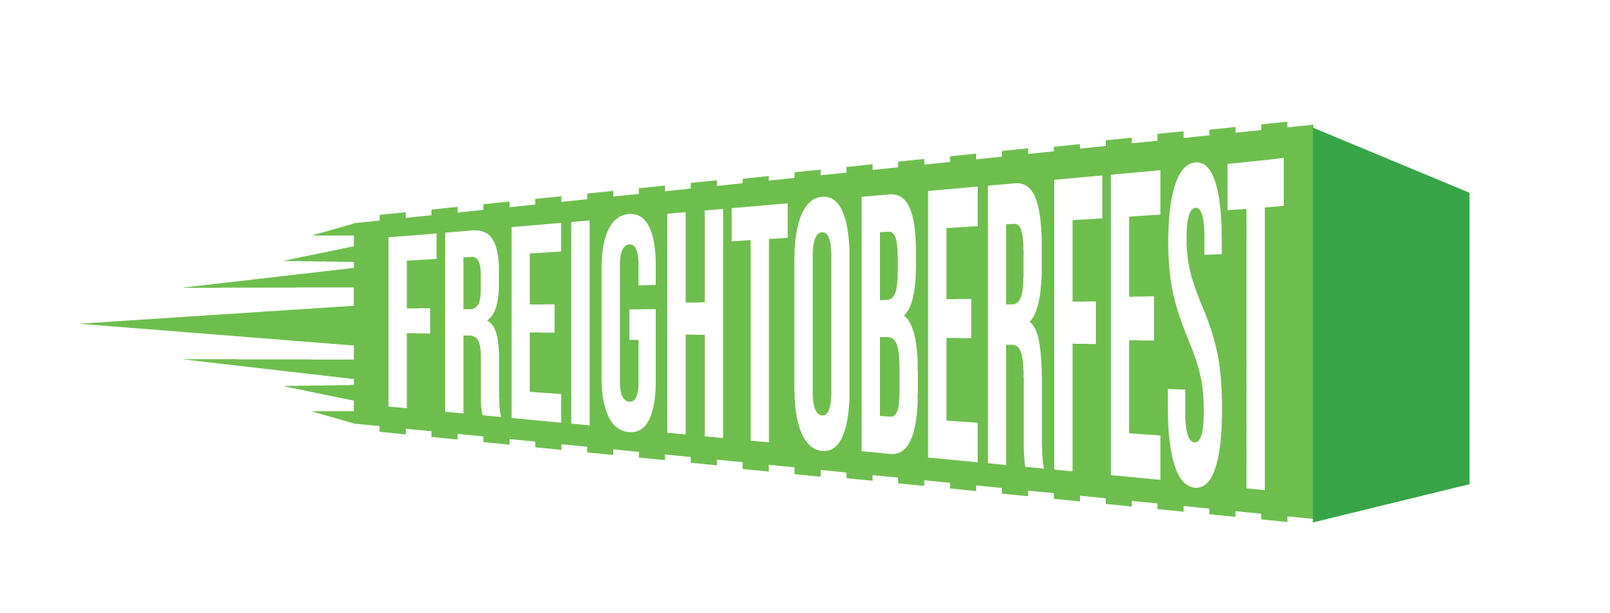 Freightoberfest03-01-01.png